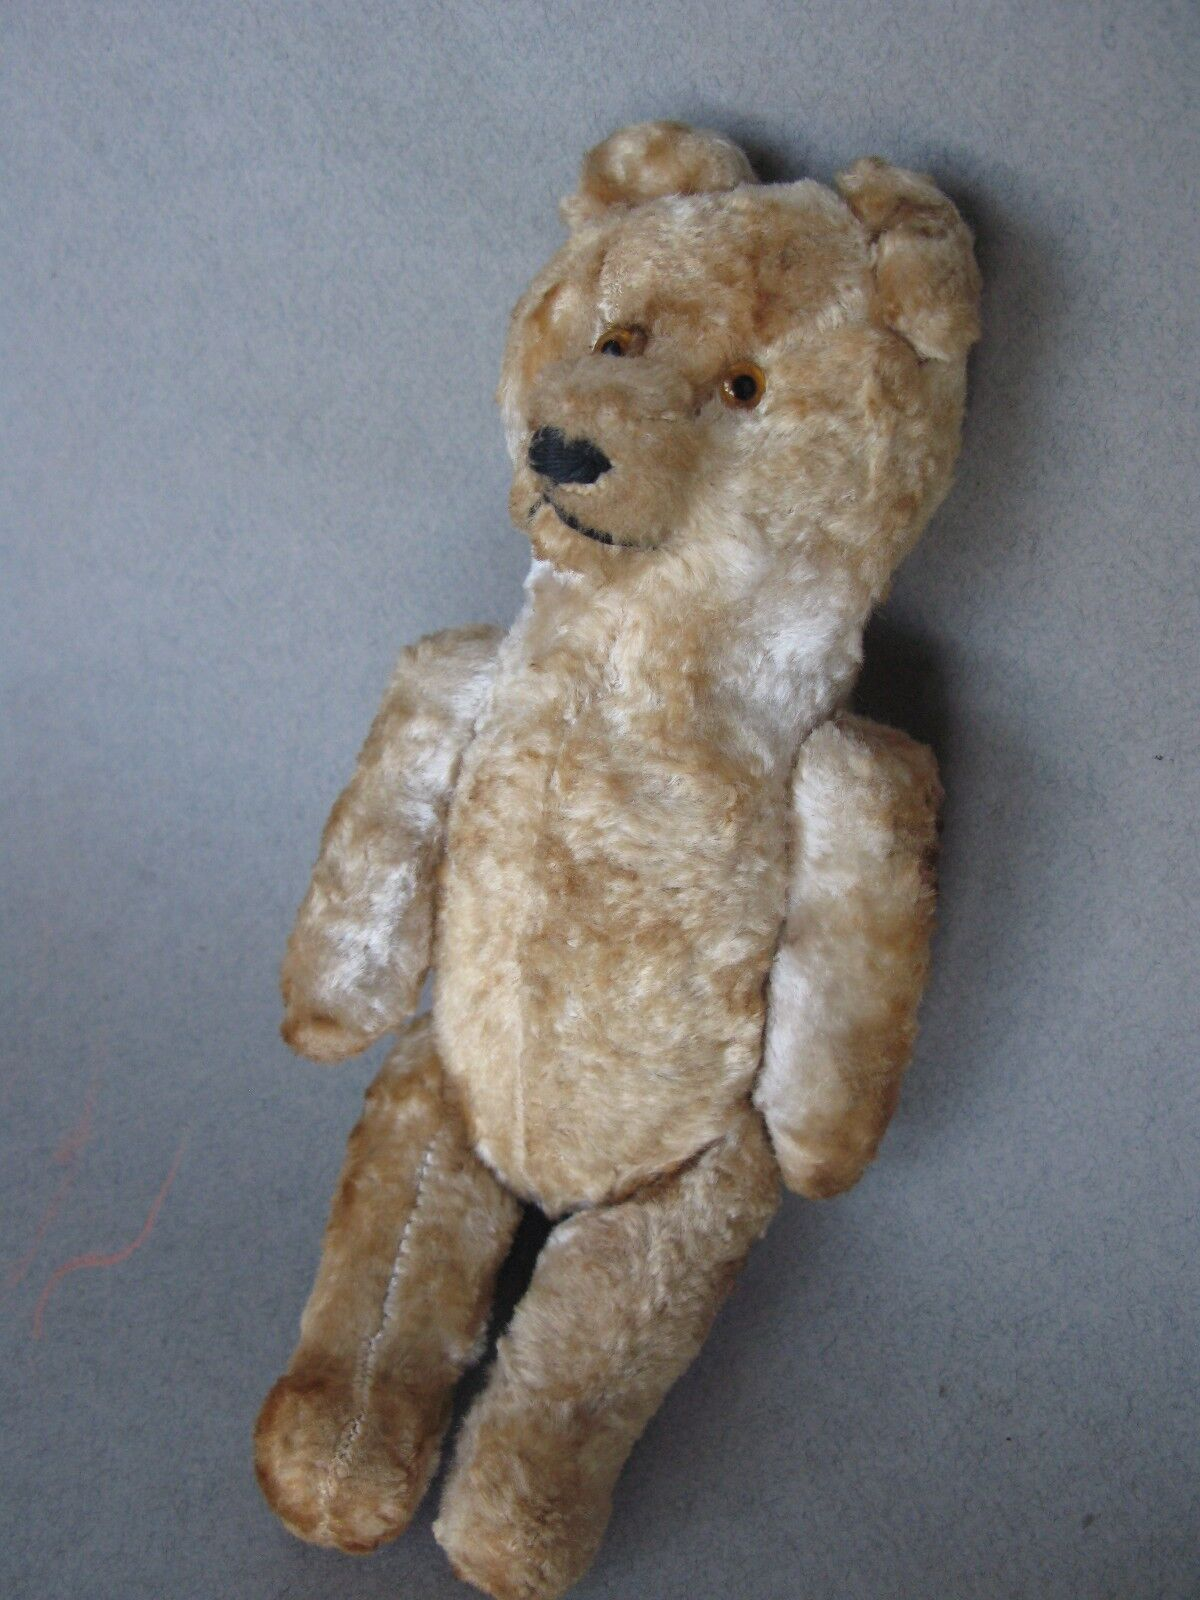 ANTIQUE (EARLY 20th CENTURY)  BEAR STEIFF  Größe 20CM 7.87IN